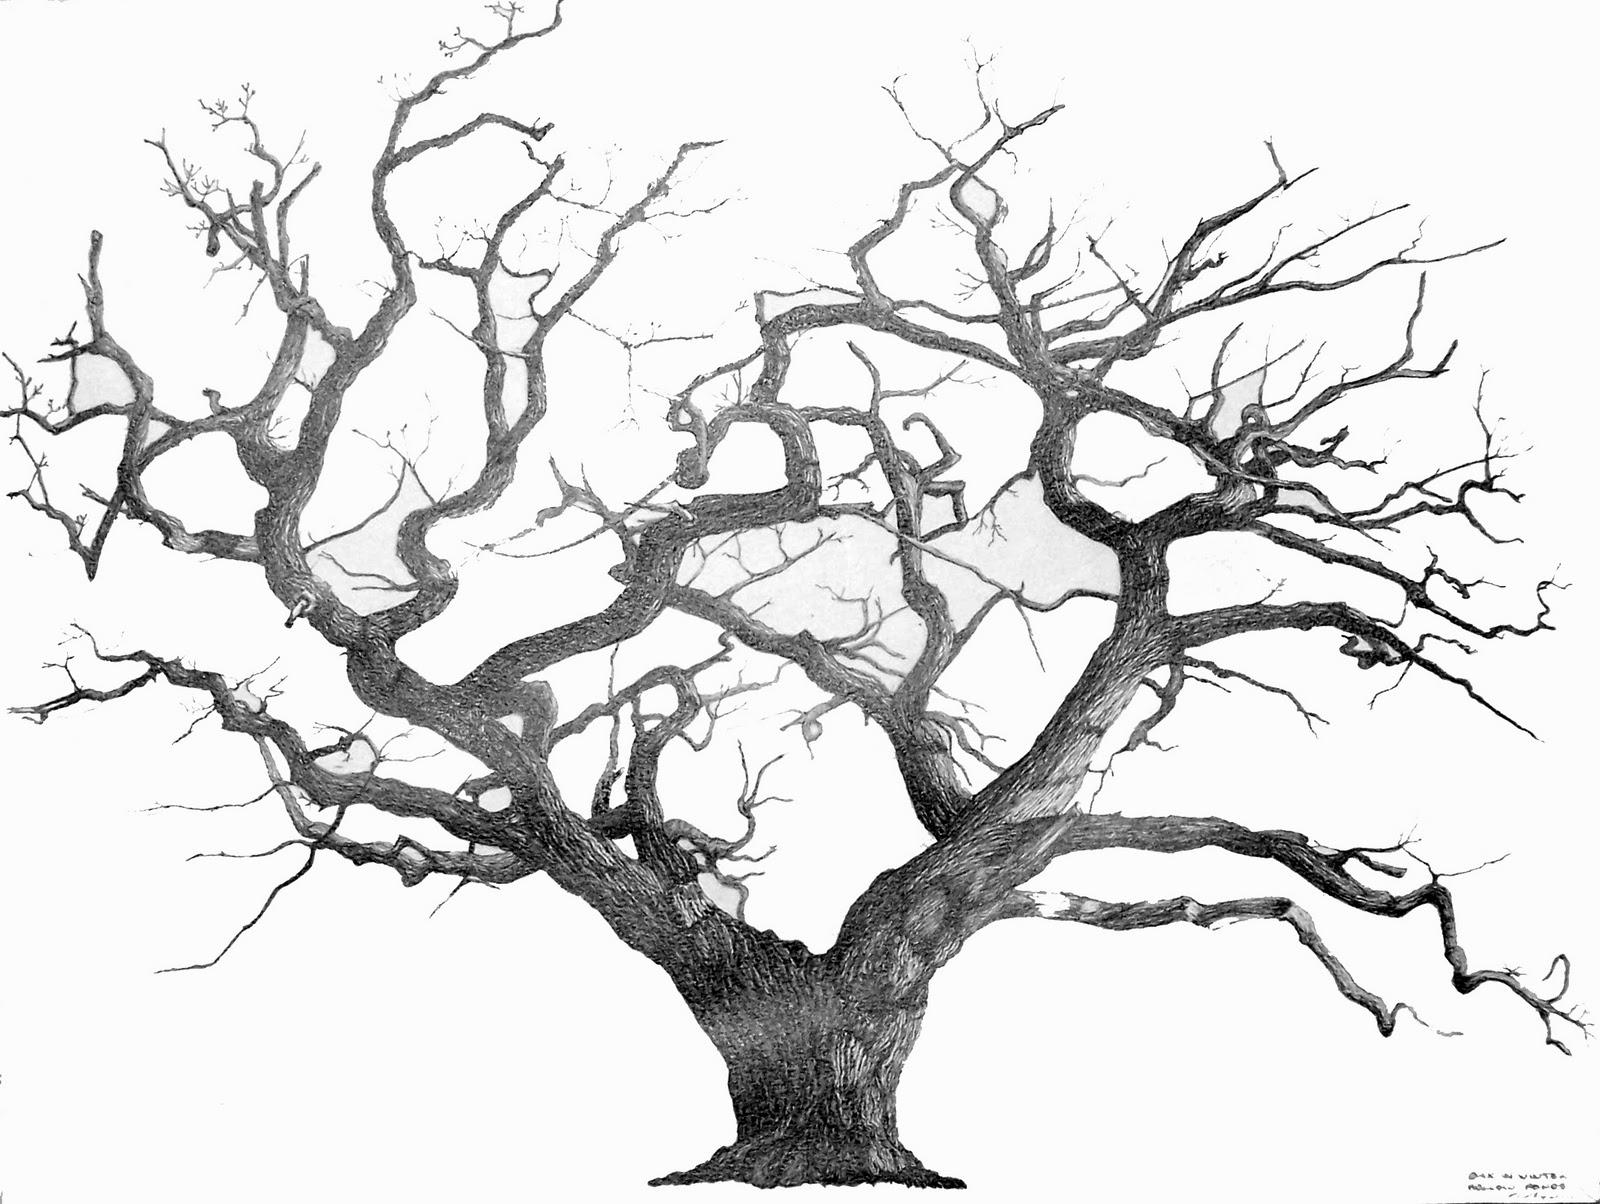 medium resolution of art works tree drawings enchanted tree clip art transparent enchanted tree clip art 1080p